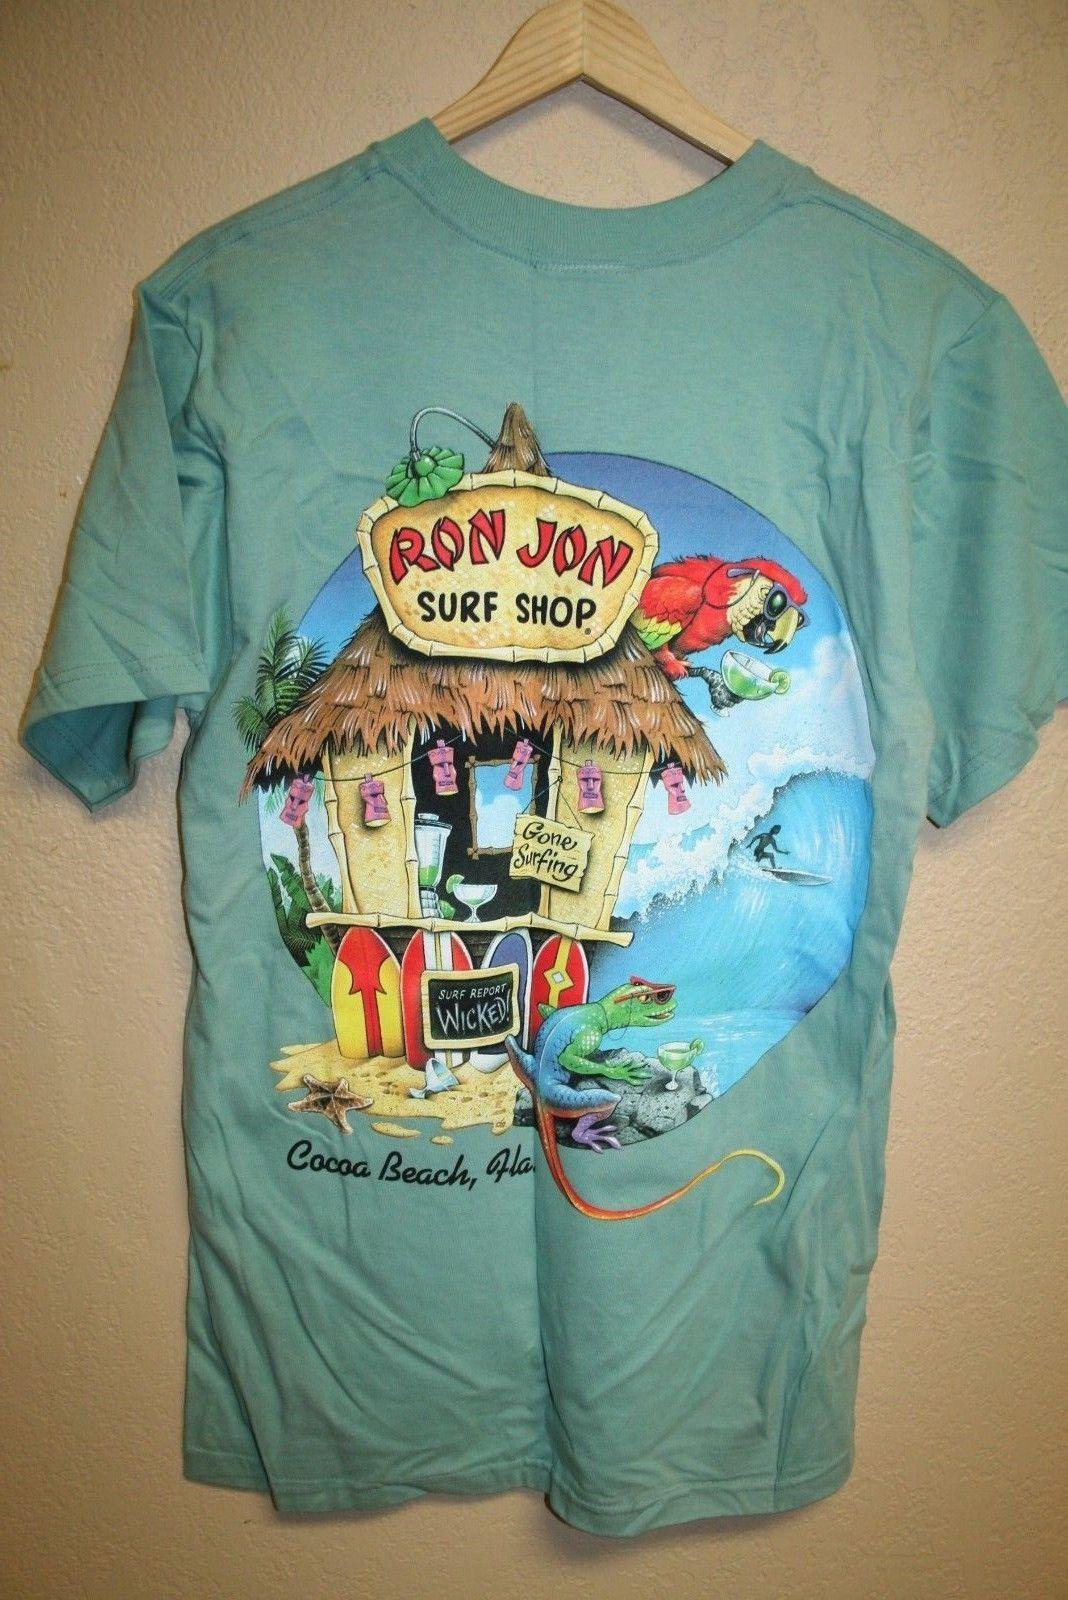 27f0b07b37 New Vtg Defective RON JON SURF SHOP Cocoa Beach Neon Graphic T Shirt SLIM  MEDIUM